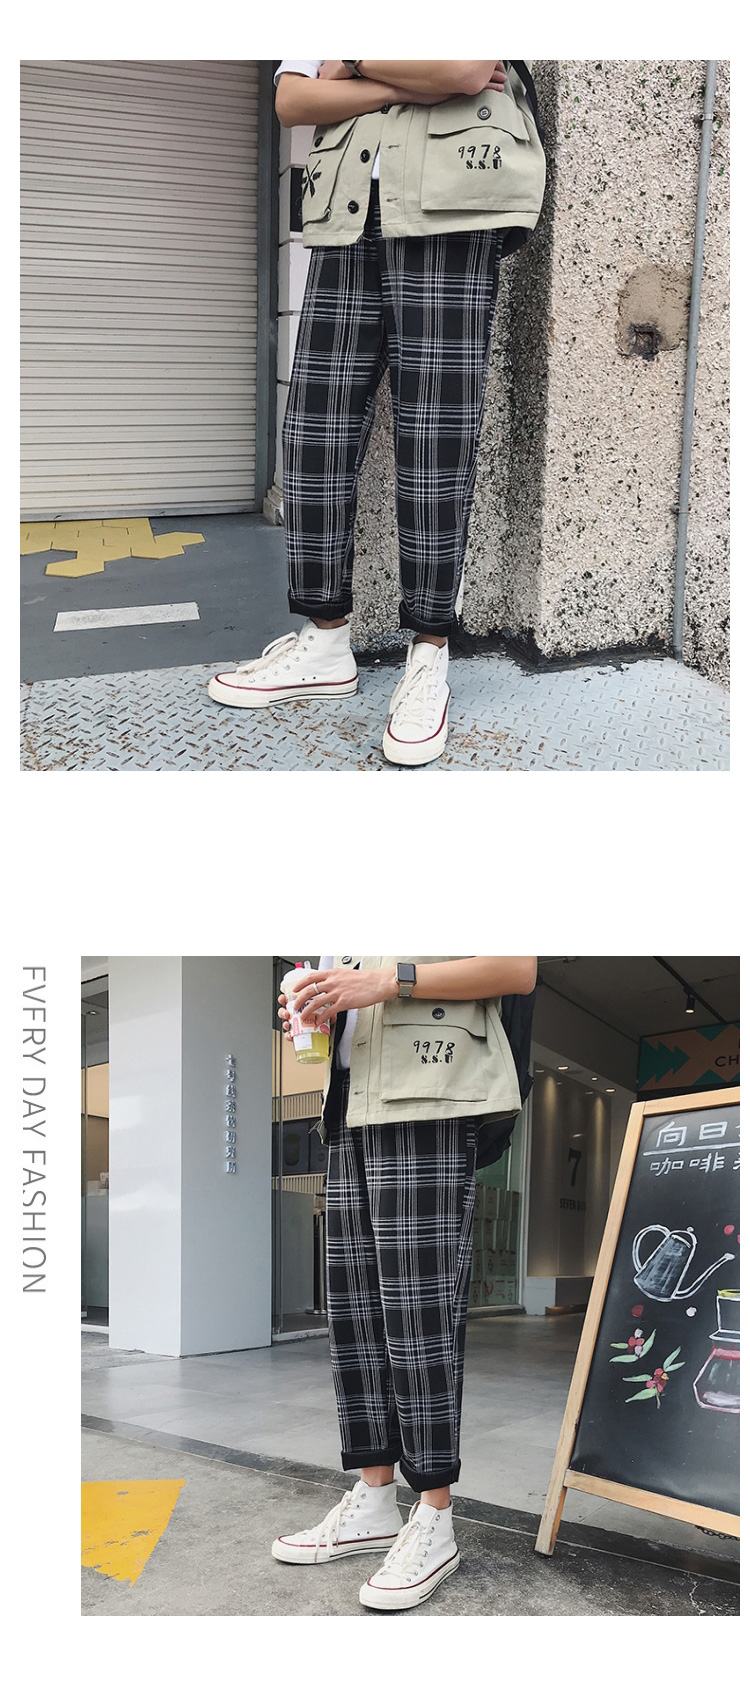 LAPPSTER Streetwear Yellow Plaid Pants Men Joggers 19 Man Casual Straight Harem Pants Men Korean Hip Hop Track Pants Plus Size 10